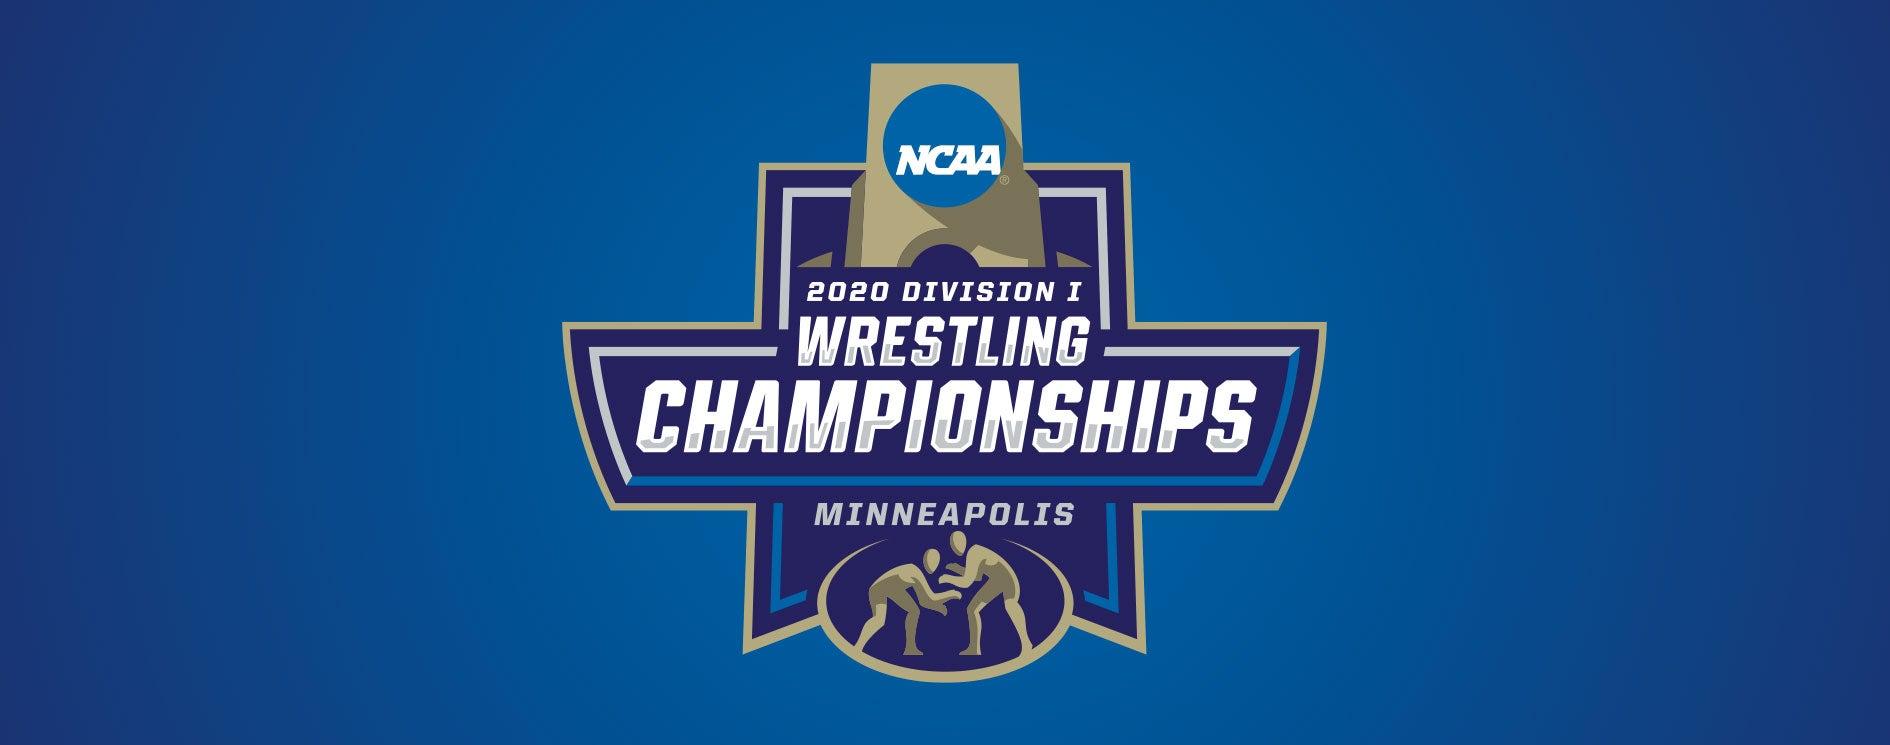 2020 DI Men's Wrestling Championship